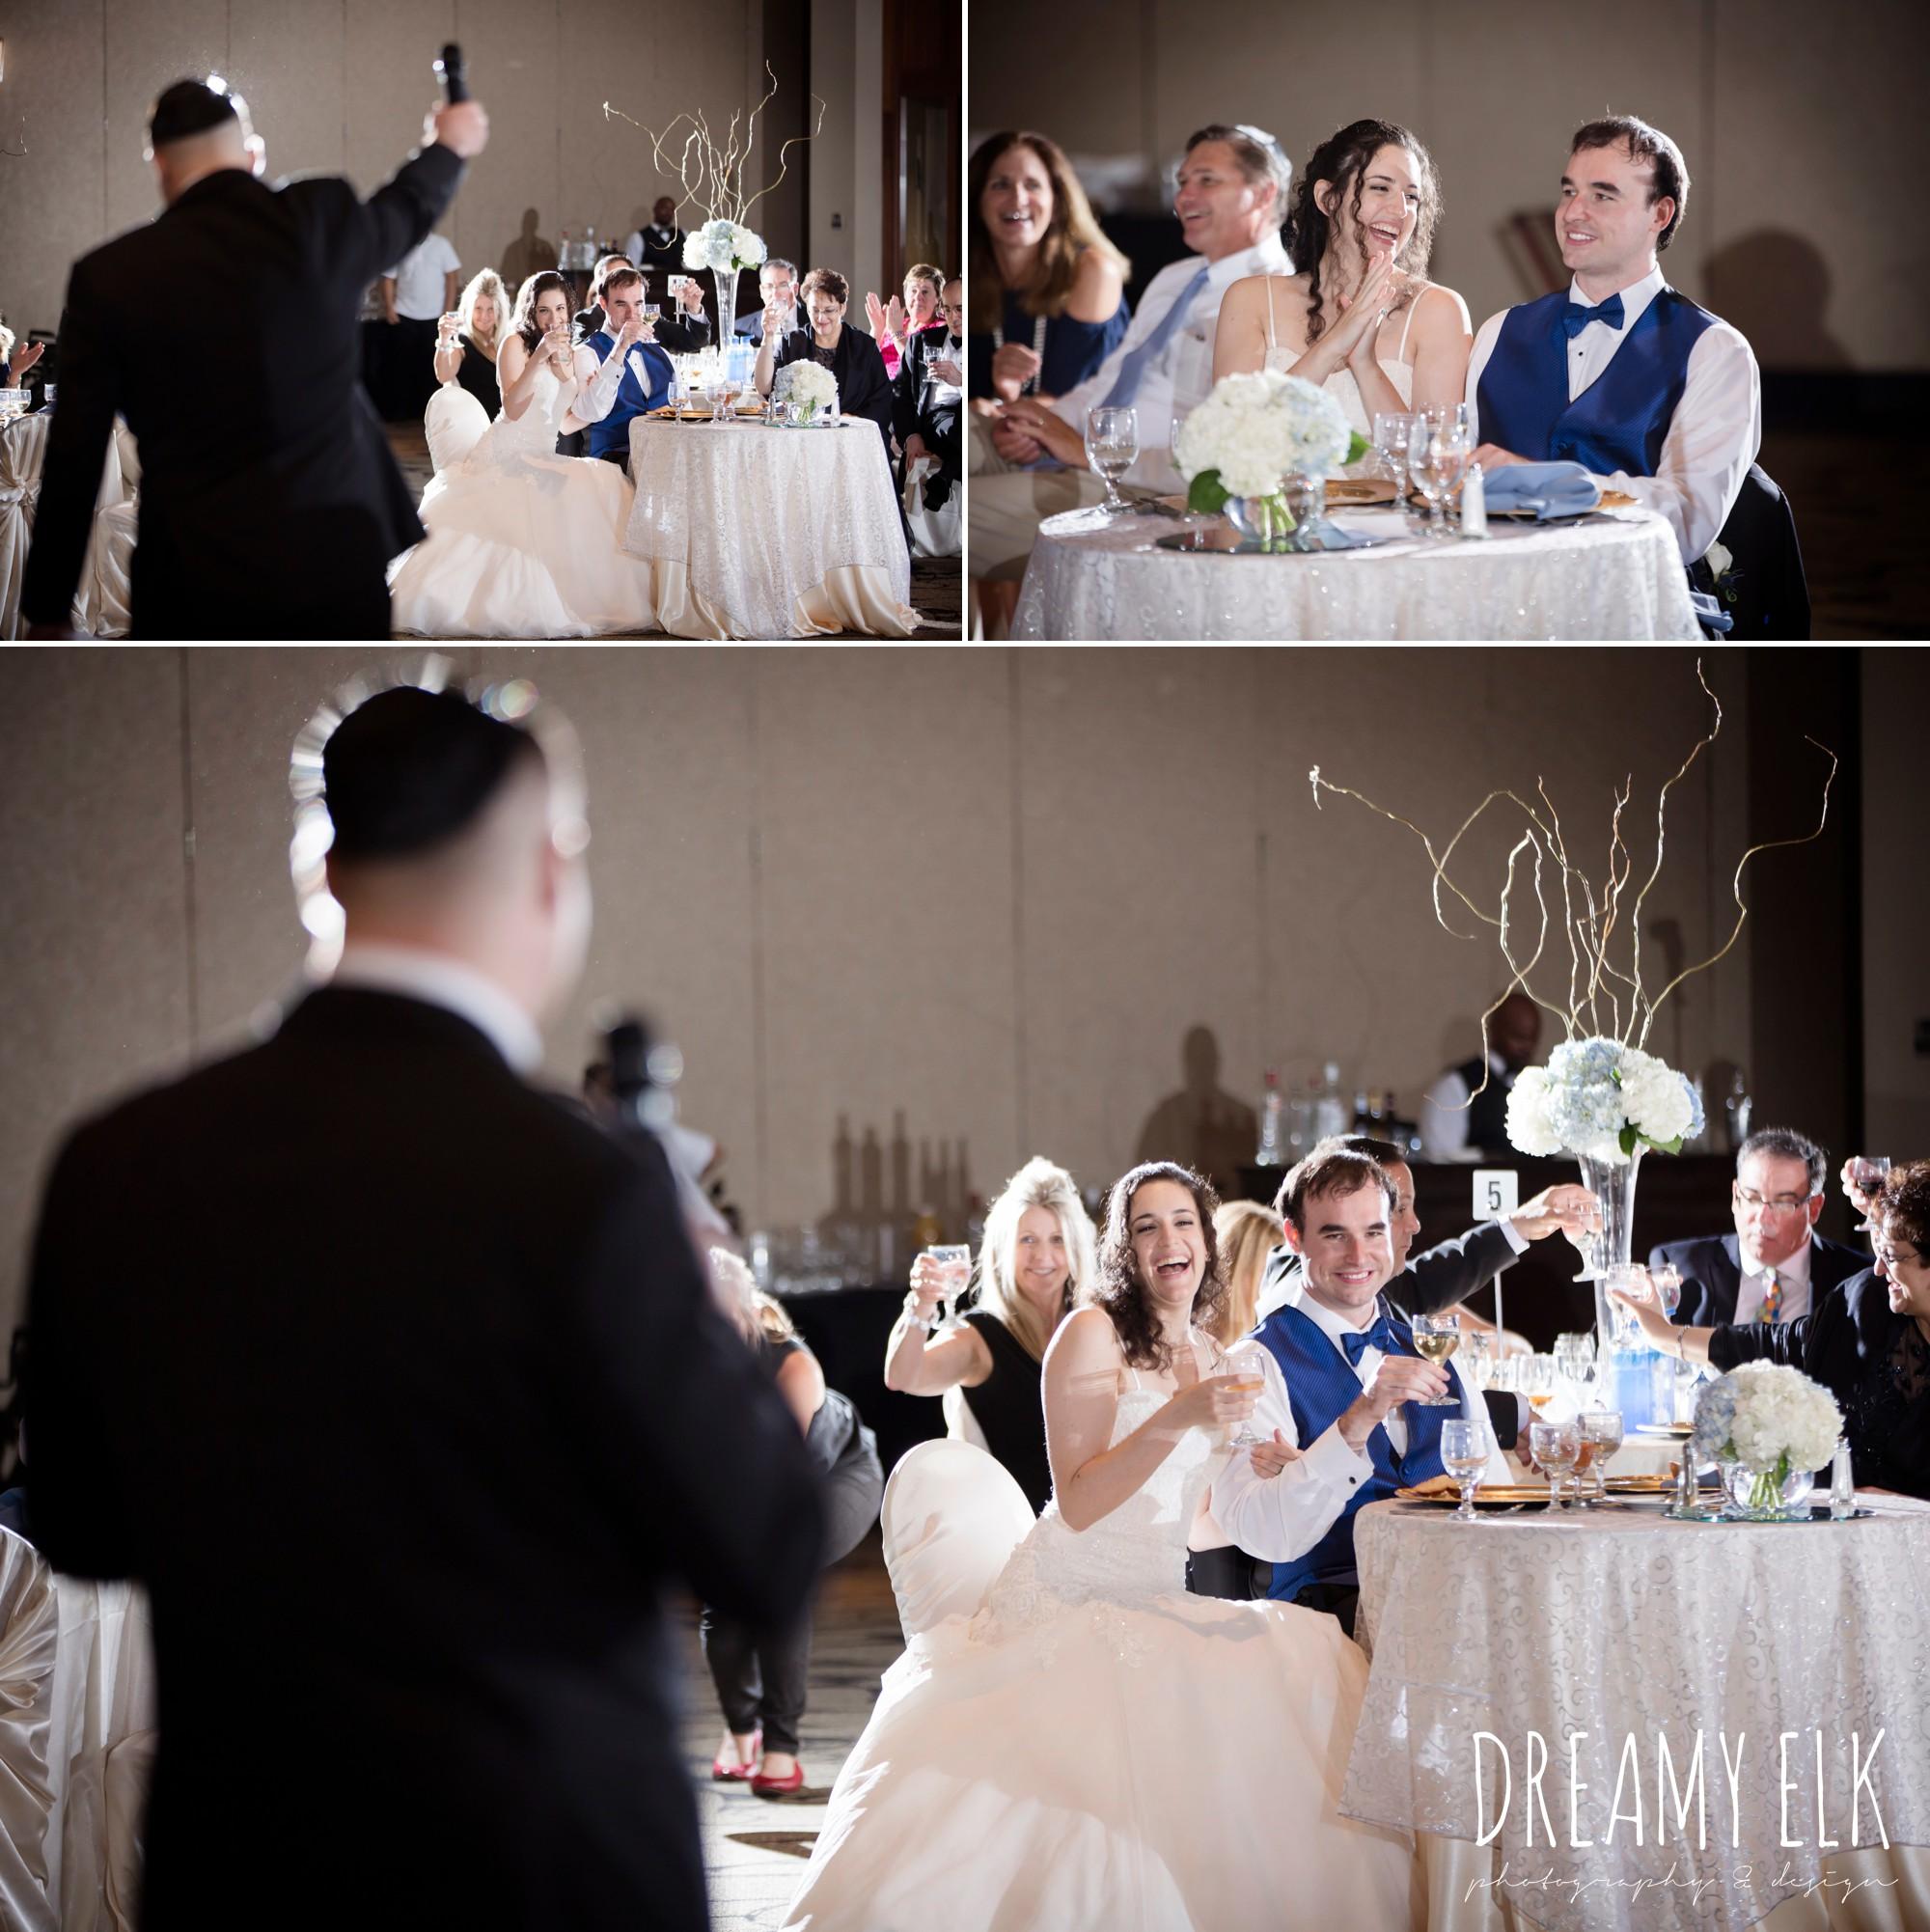 toasts at wedding reception, summer june jewish wedding photo {dreamy elk photography and design}